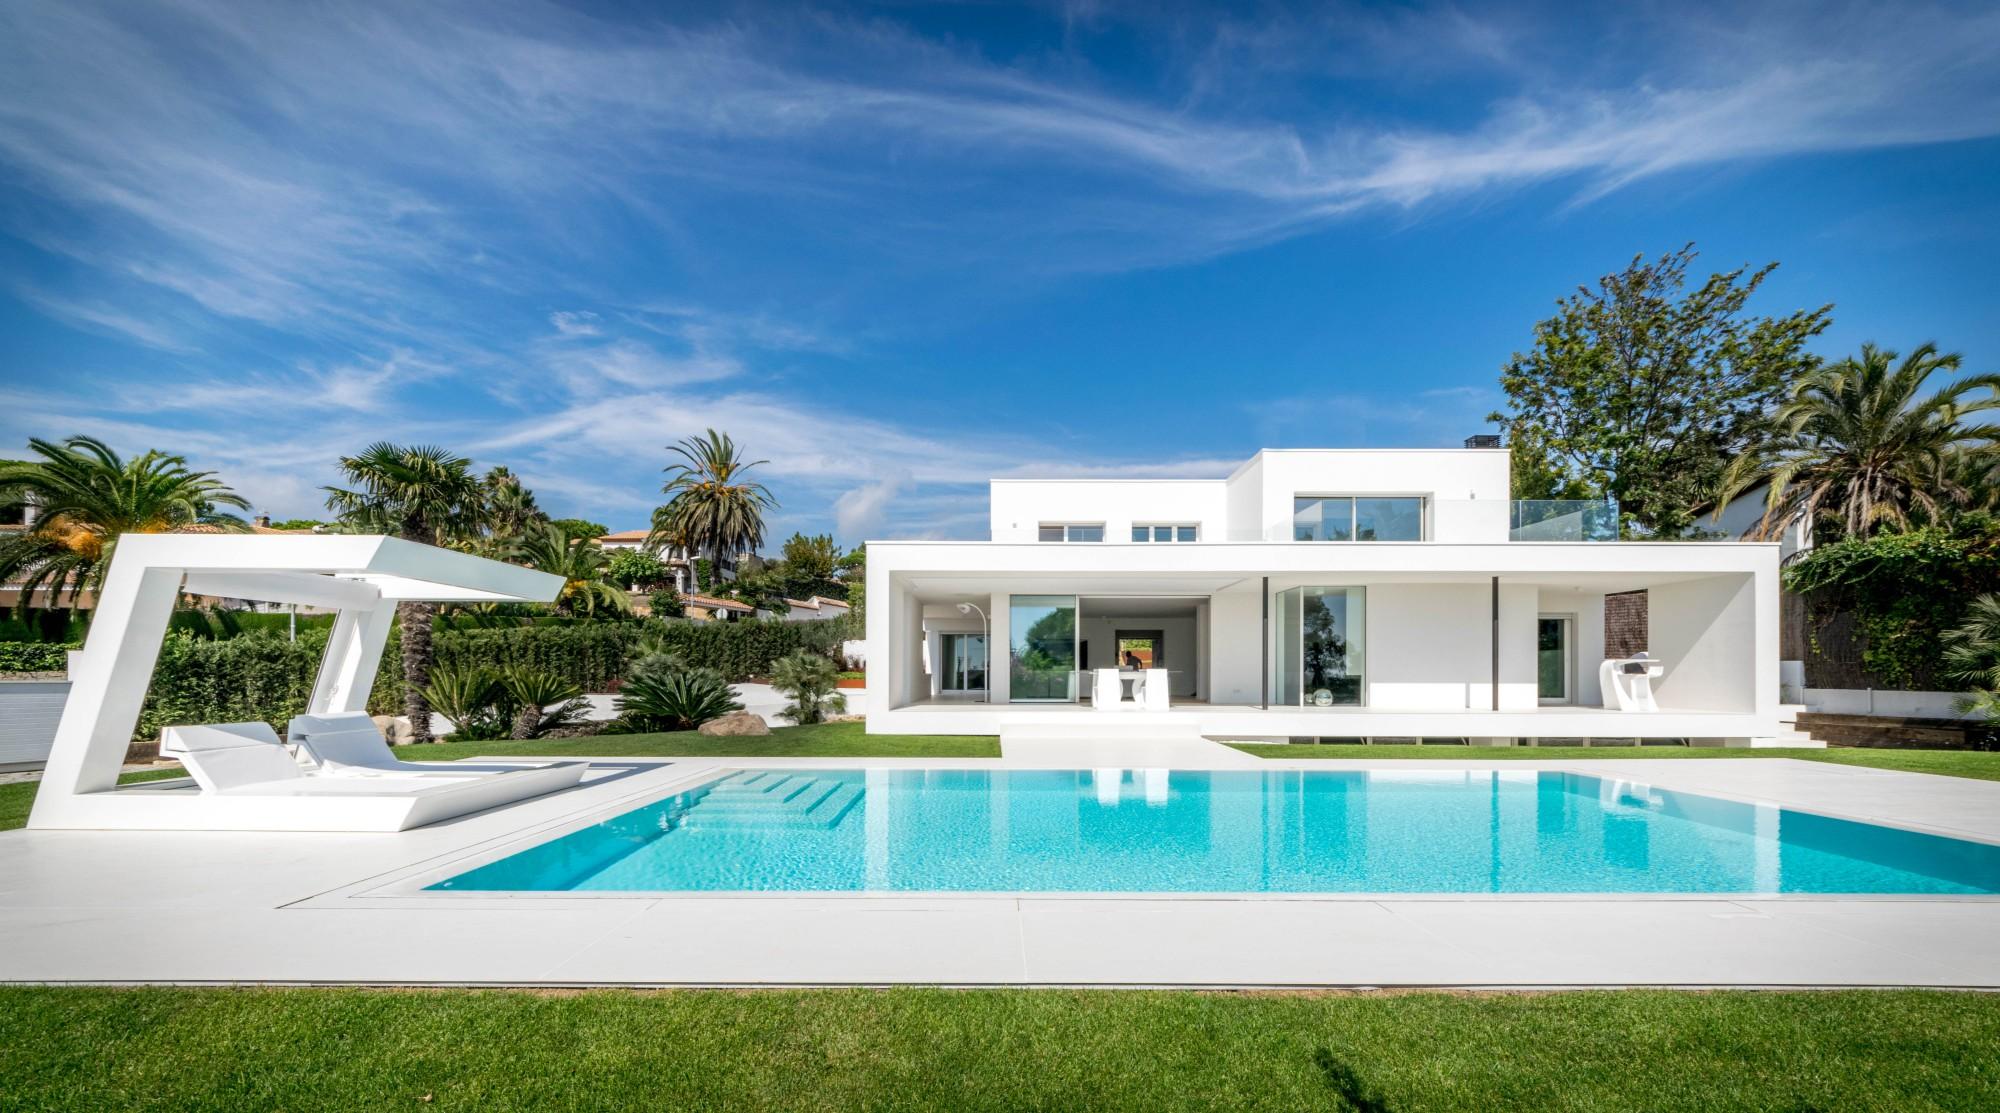 Casas de sonho  idealistanews